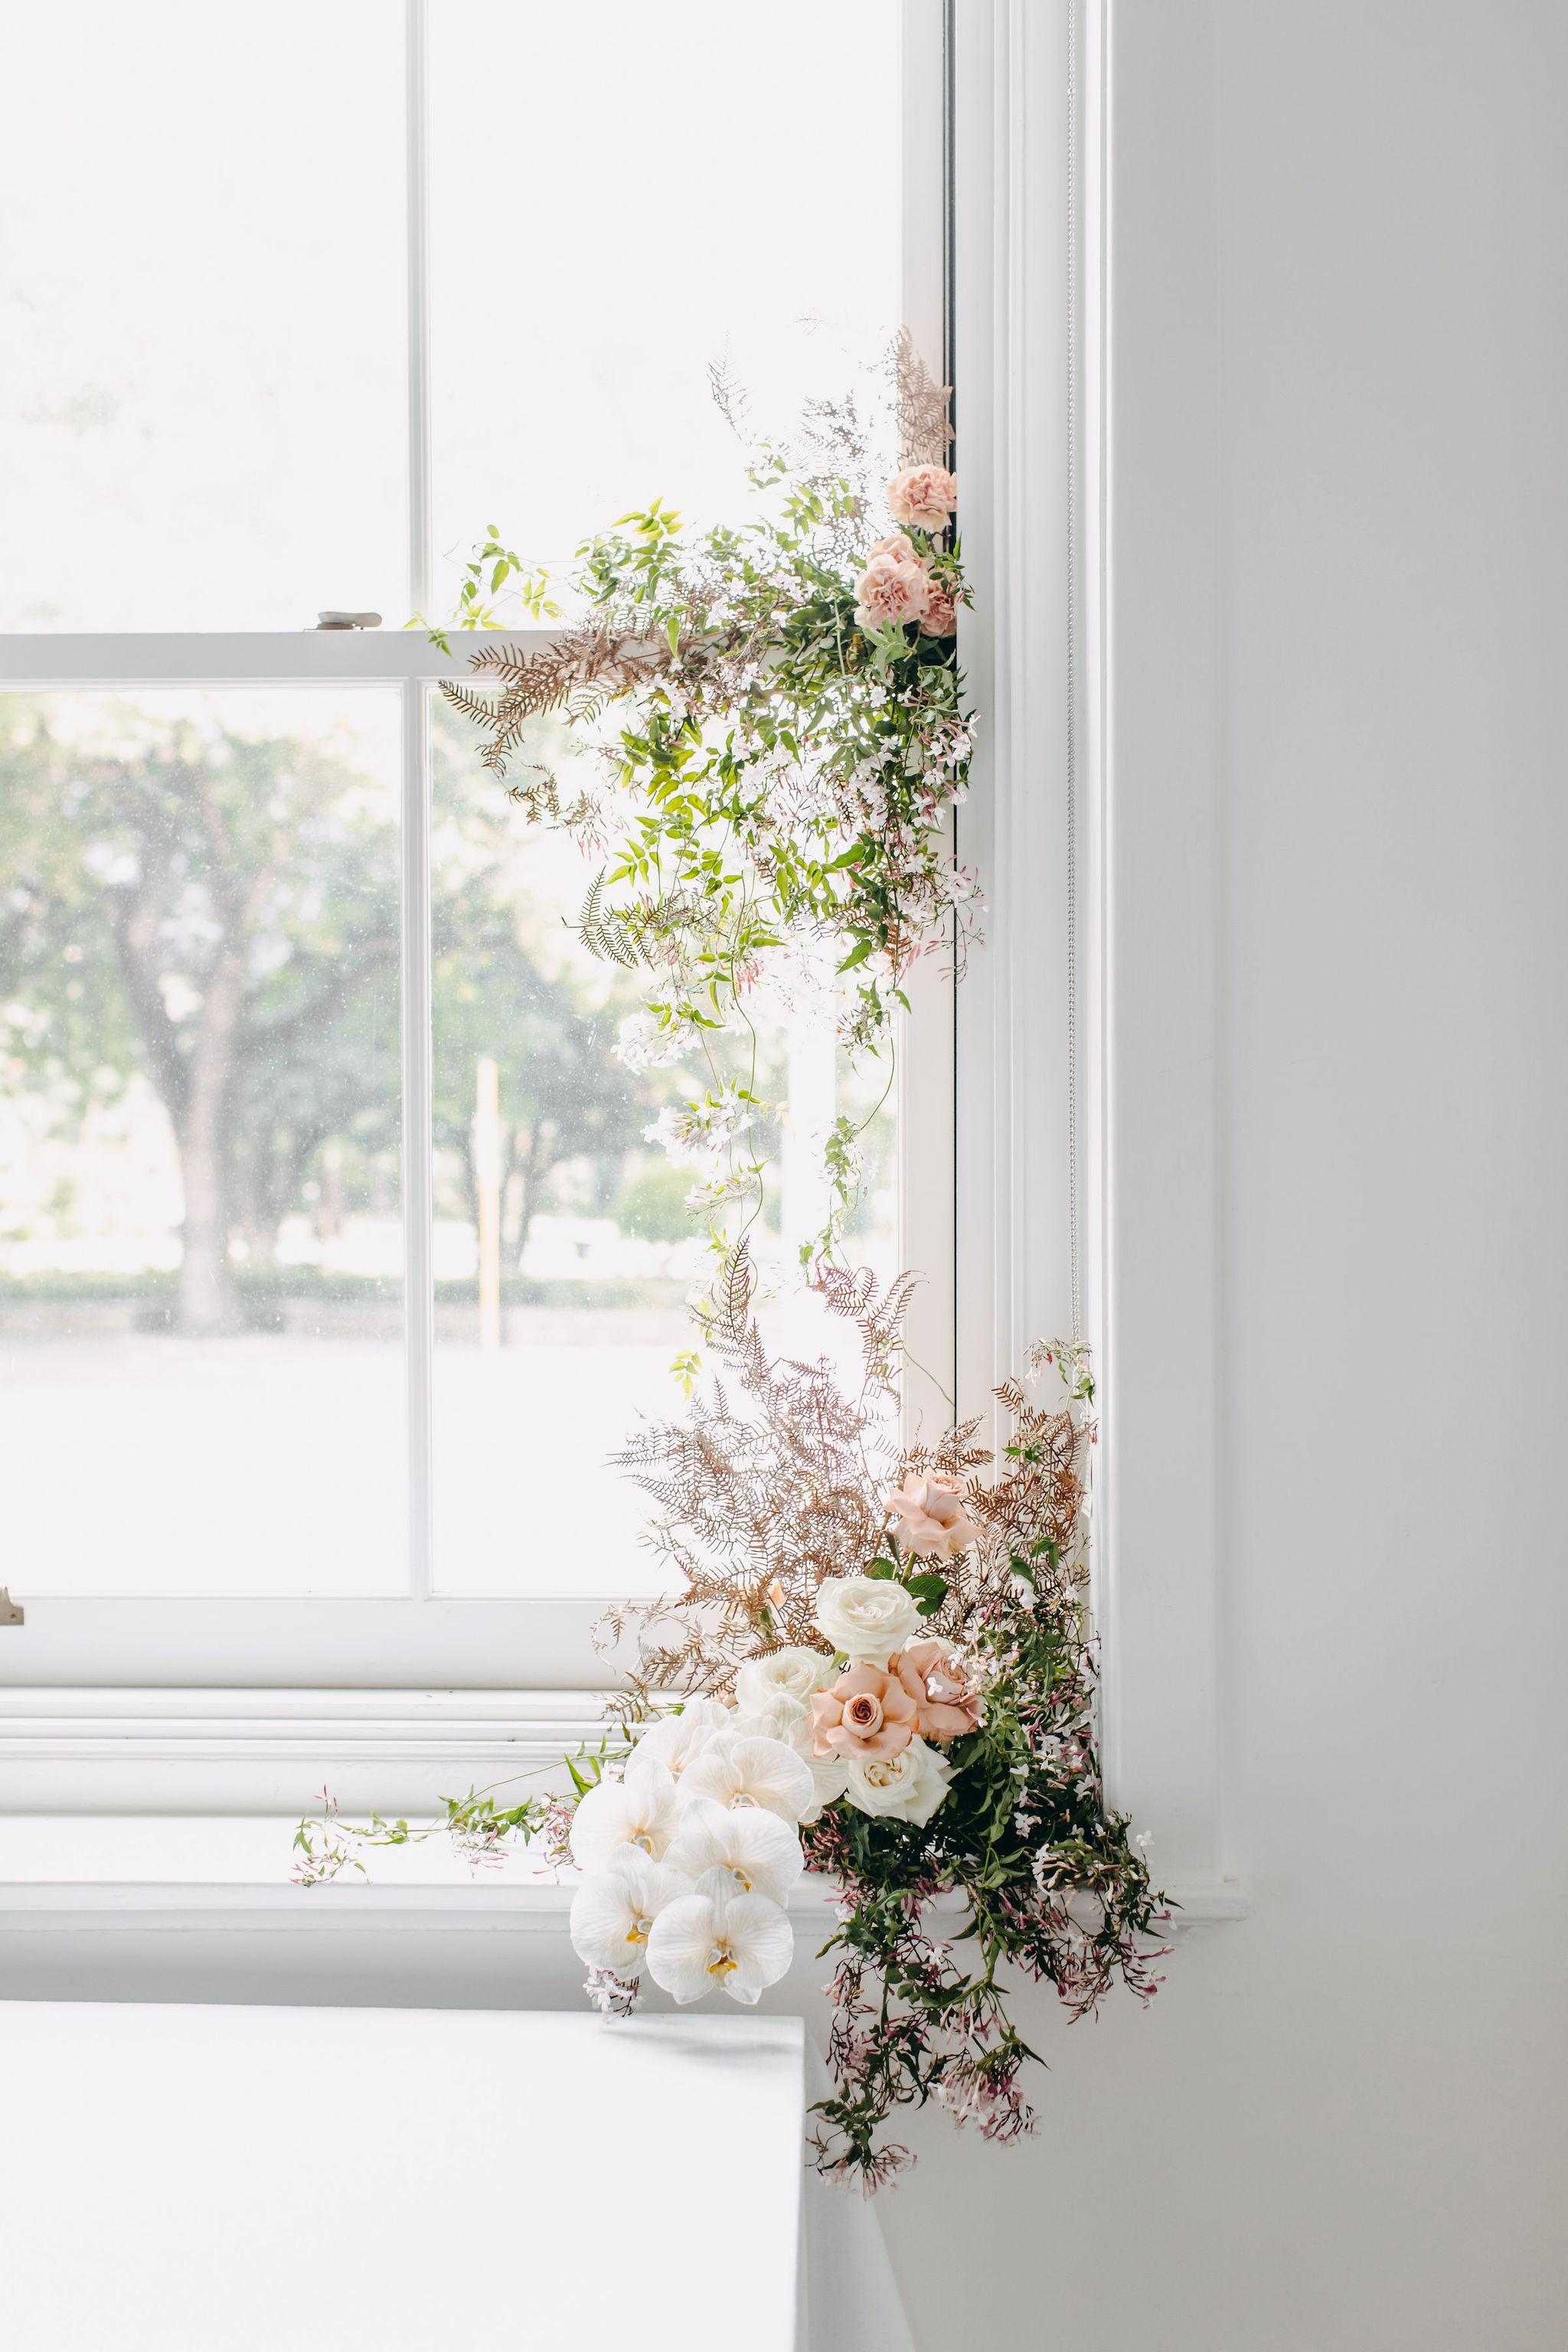 207-WEDDINGSTYLEDSHOOT-STATEBUILDINGS-28OCT2019